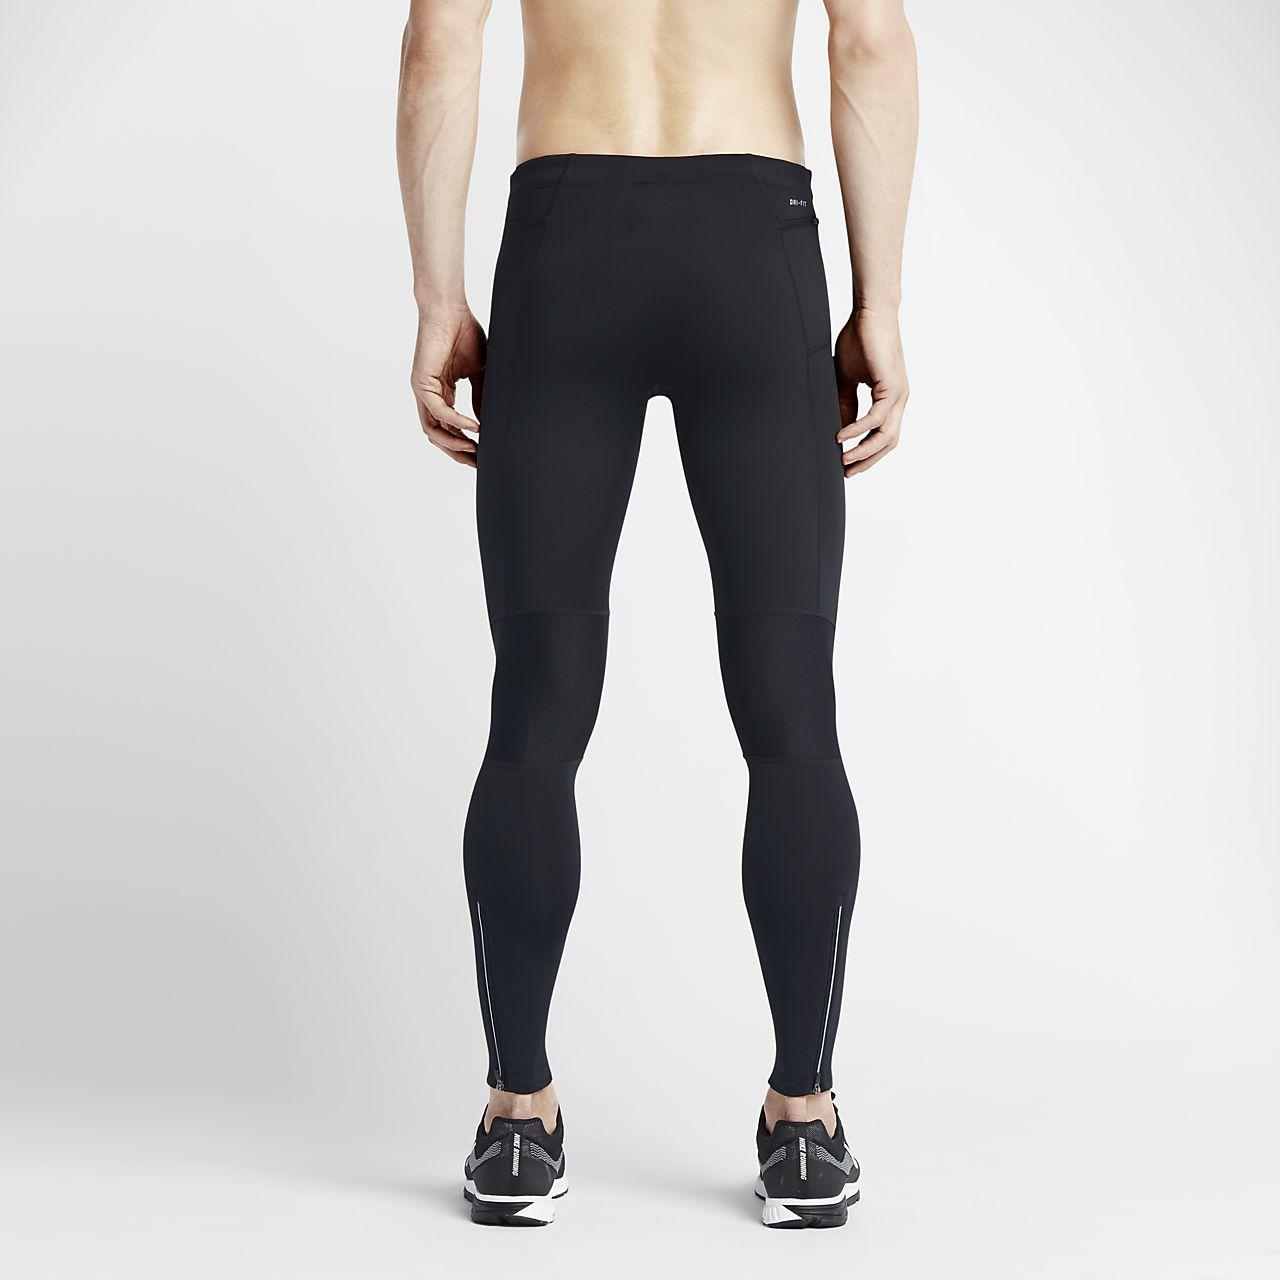 f50bc58a536a21 Nike Power Tech Herren-Lauftights. Nike.com DE